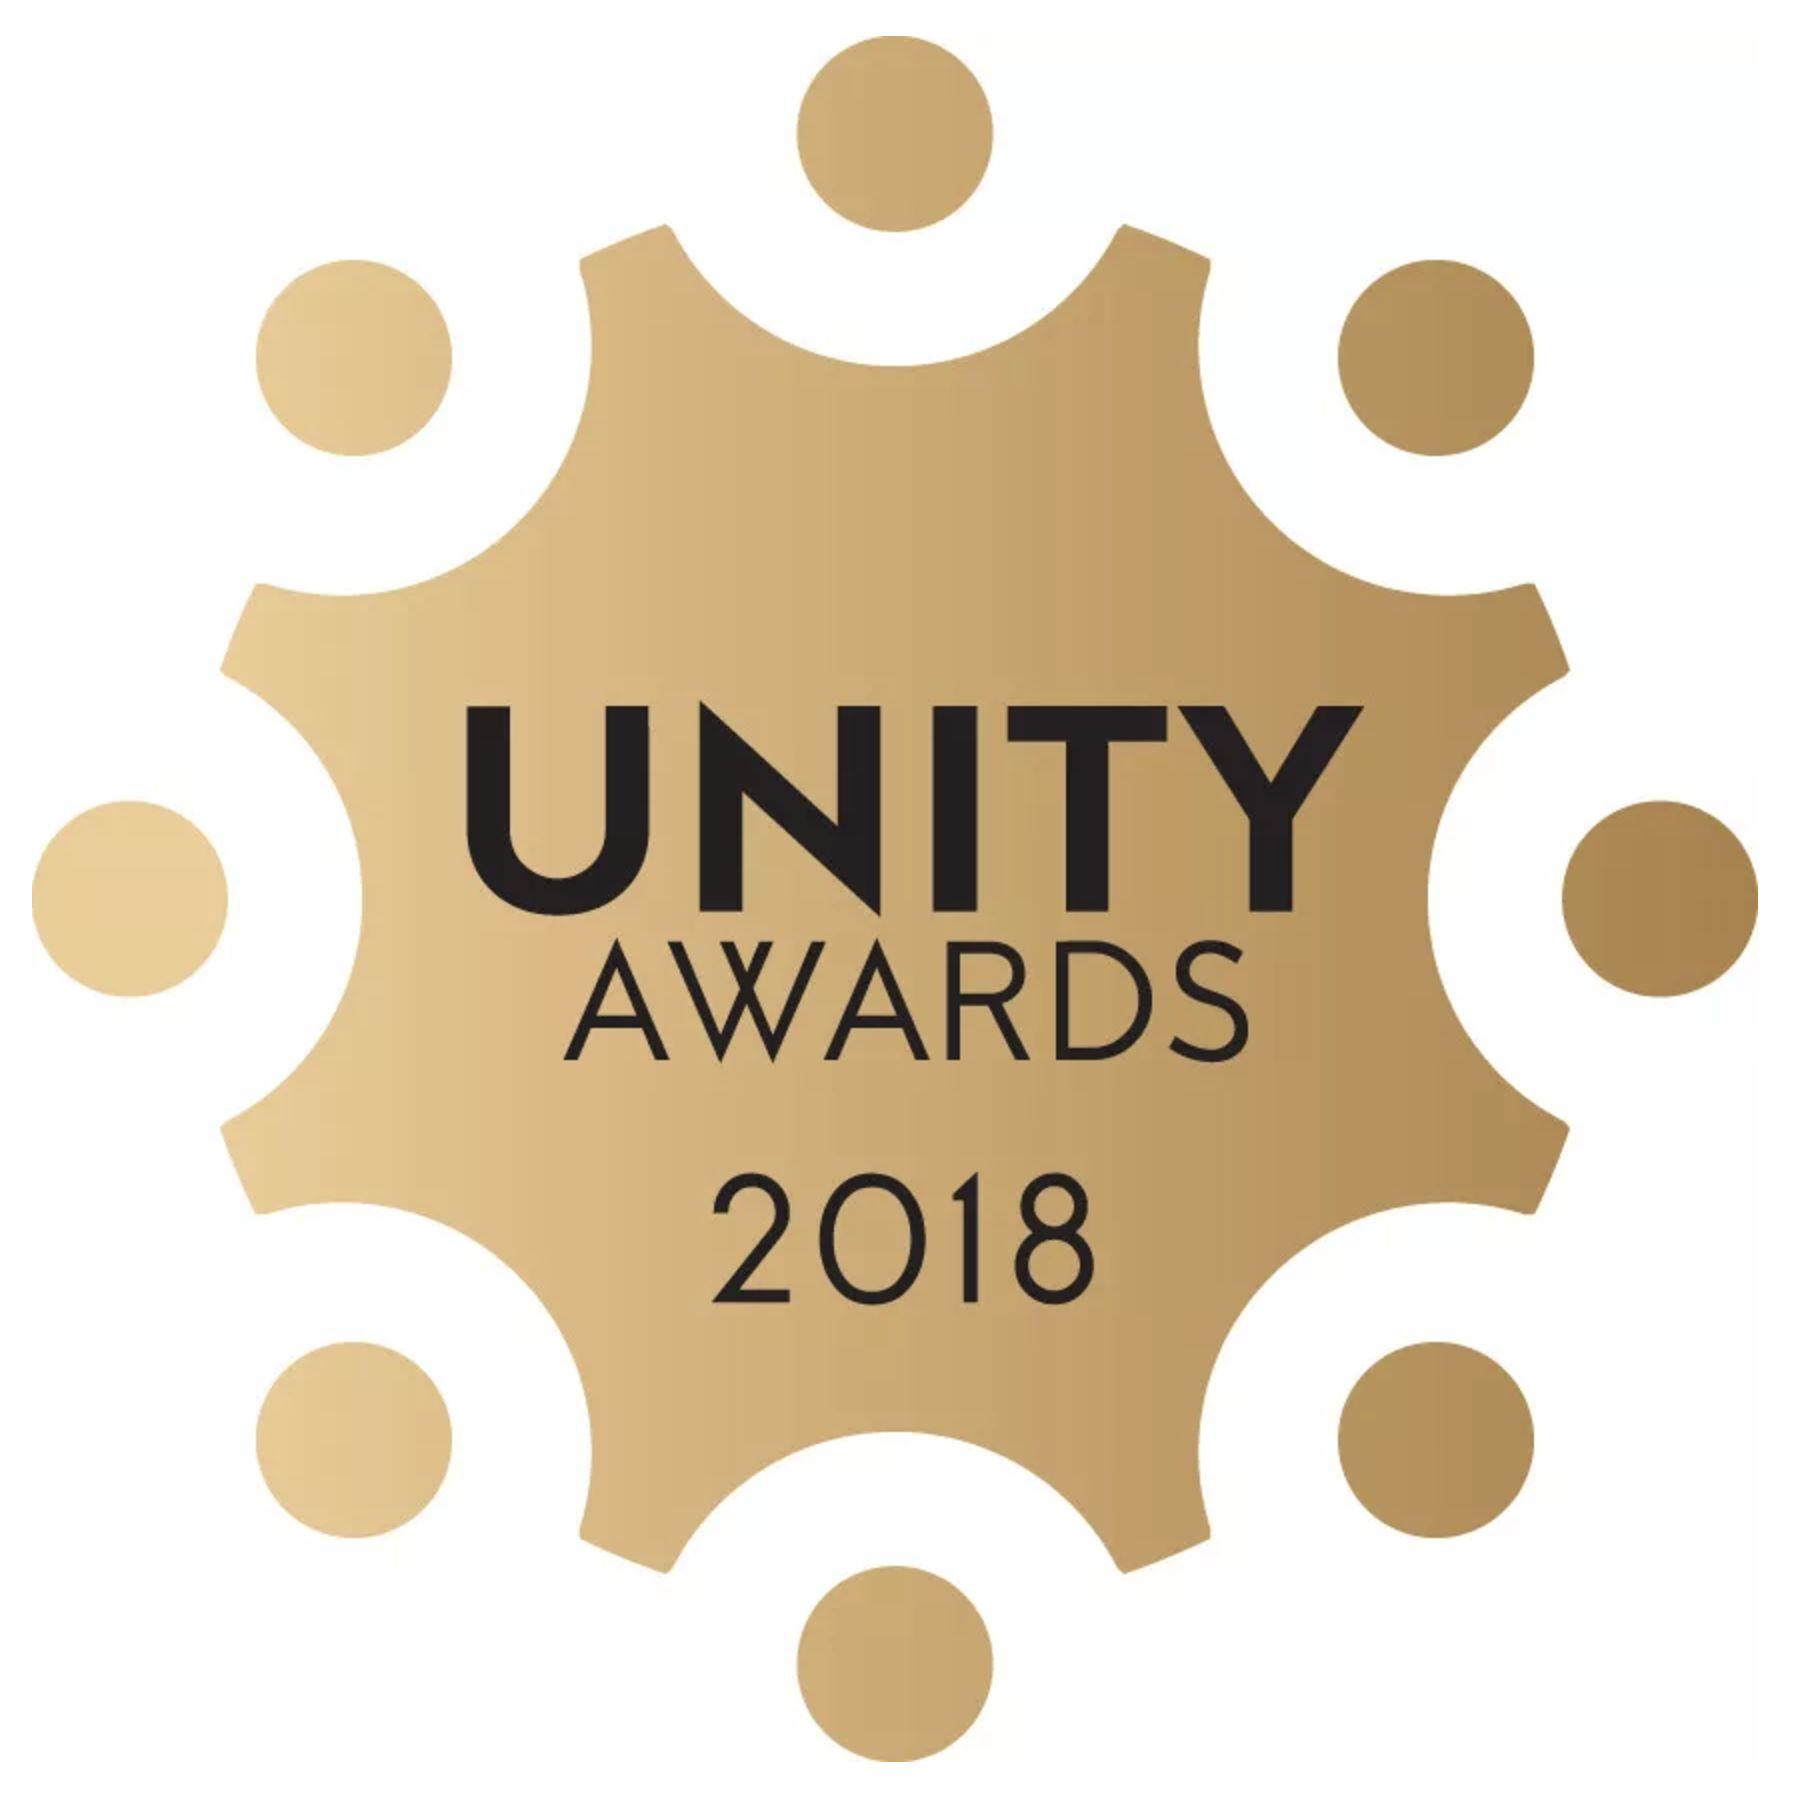 Unity awards 2018 vfml9n